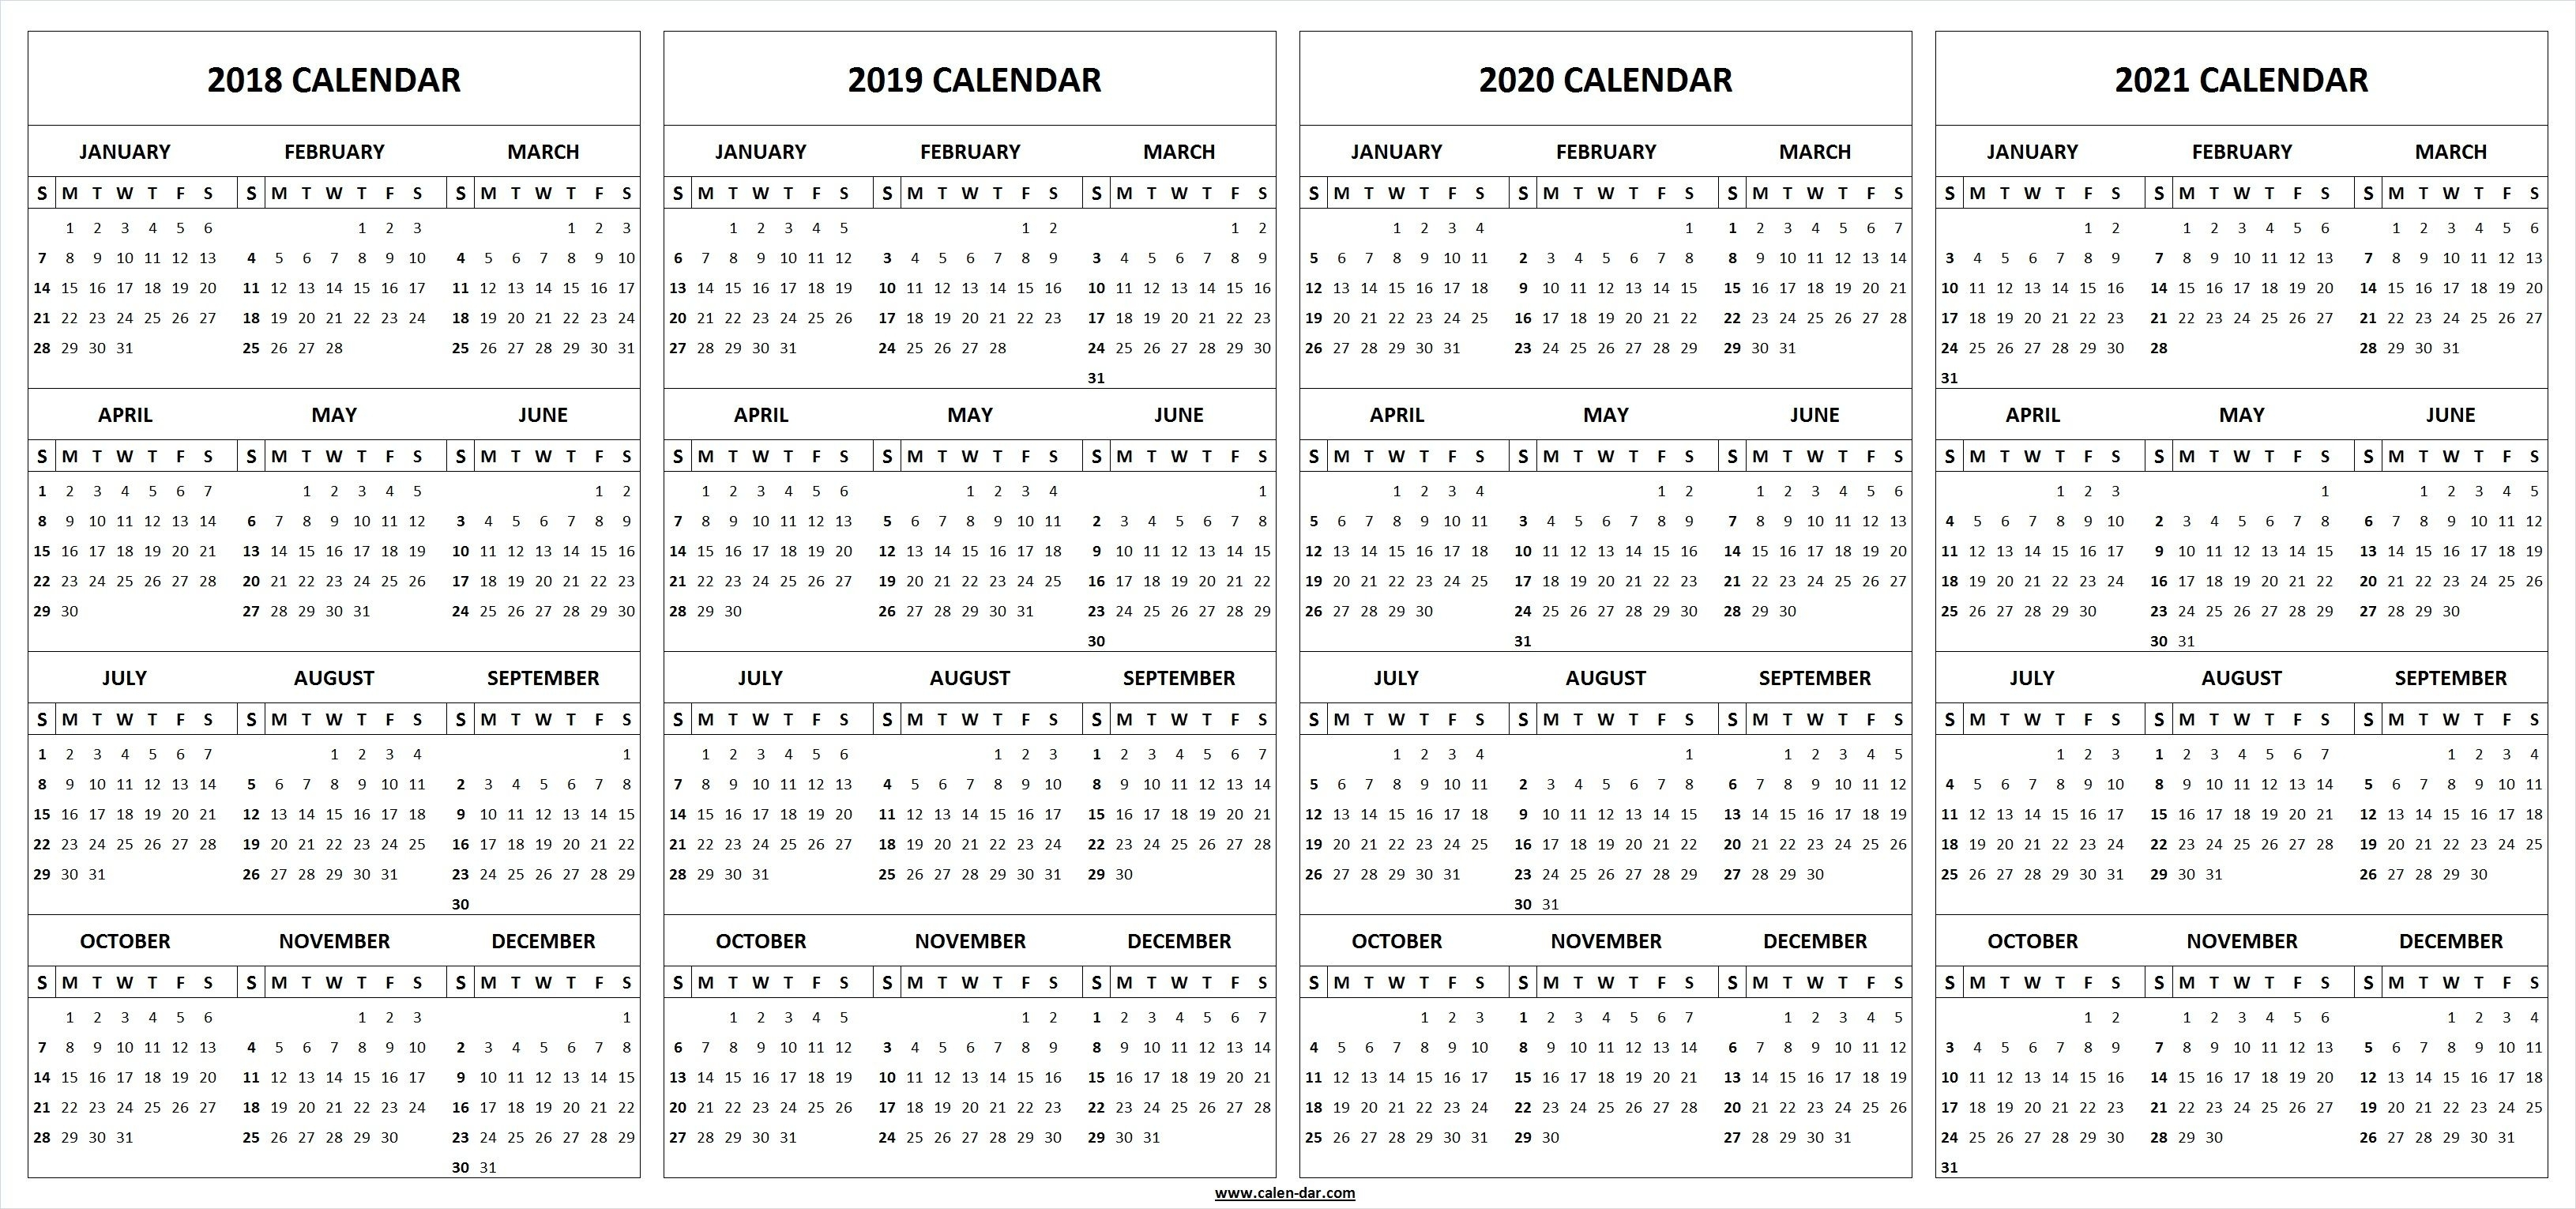 4 Four Year 2018 2019 2020 2021 Calendar Printable Template